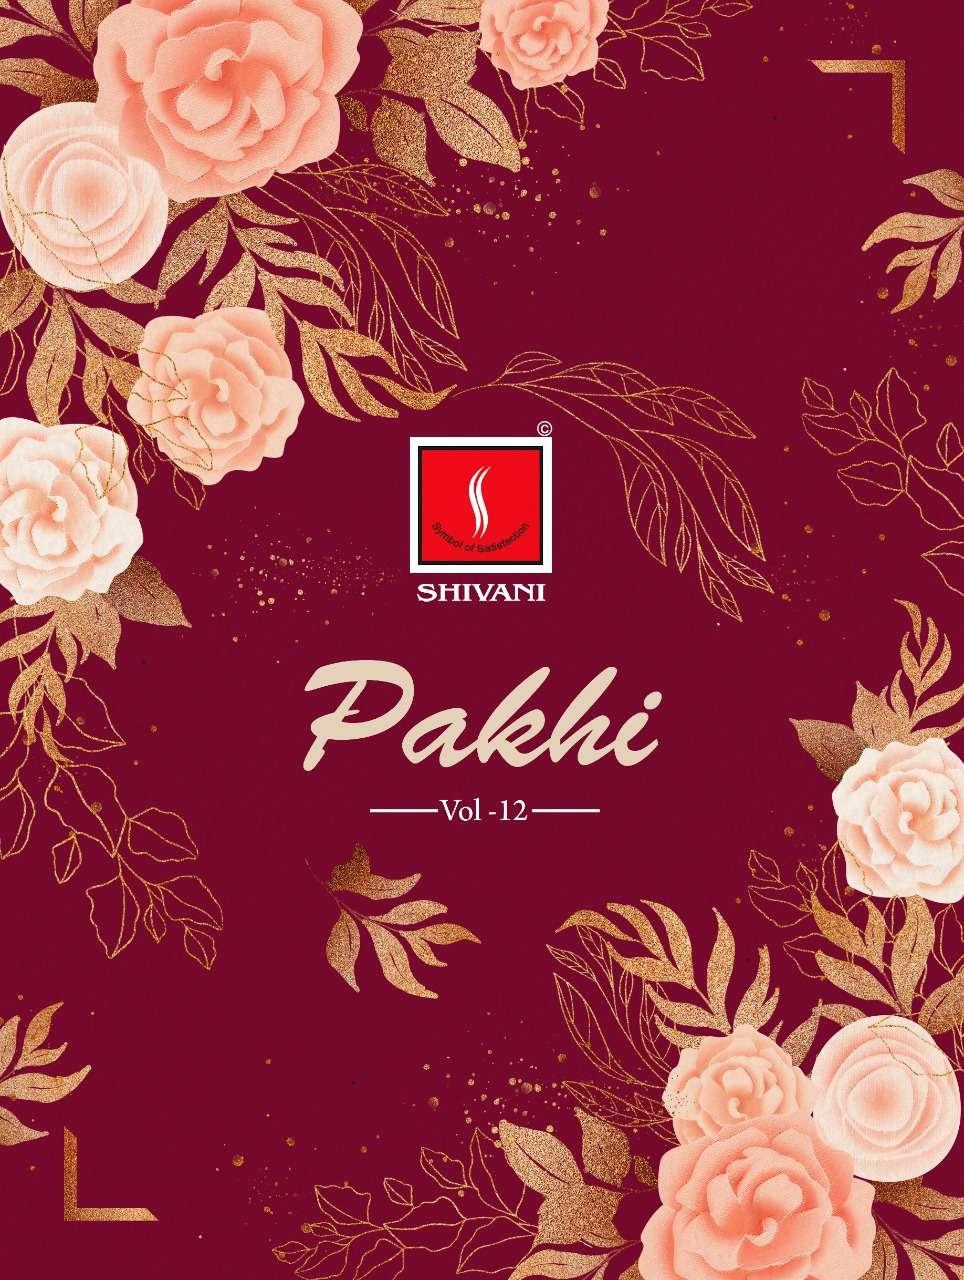 Shivani Pakhi Vol 12 cotton printed dress materials wholesaler